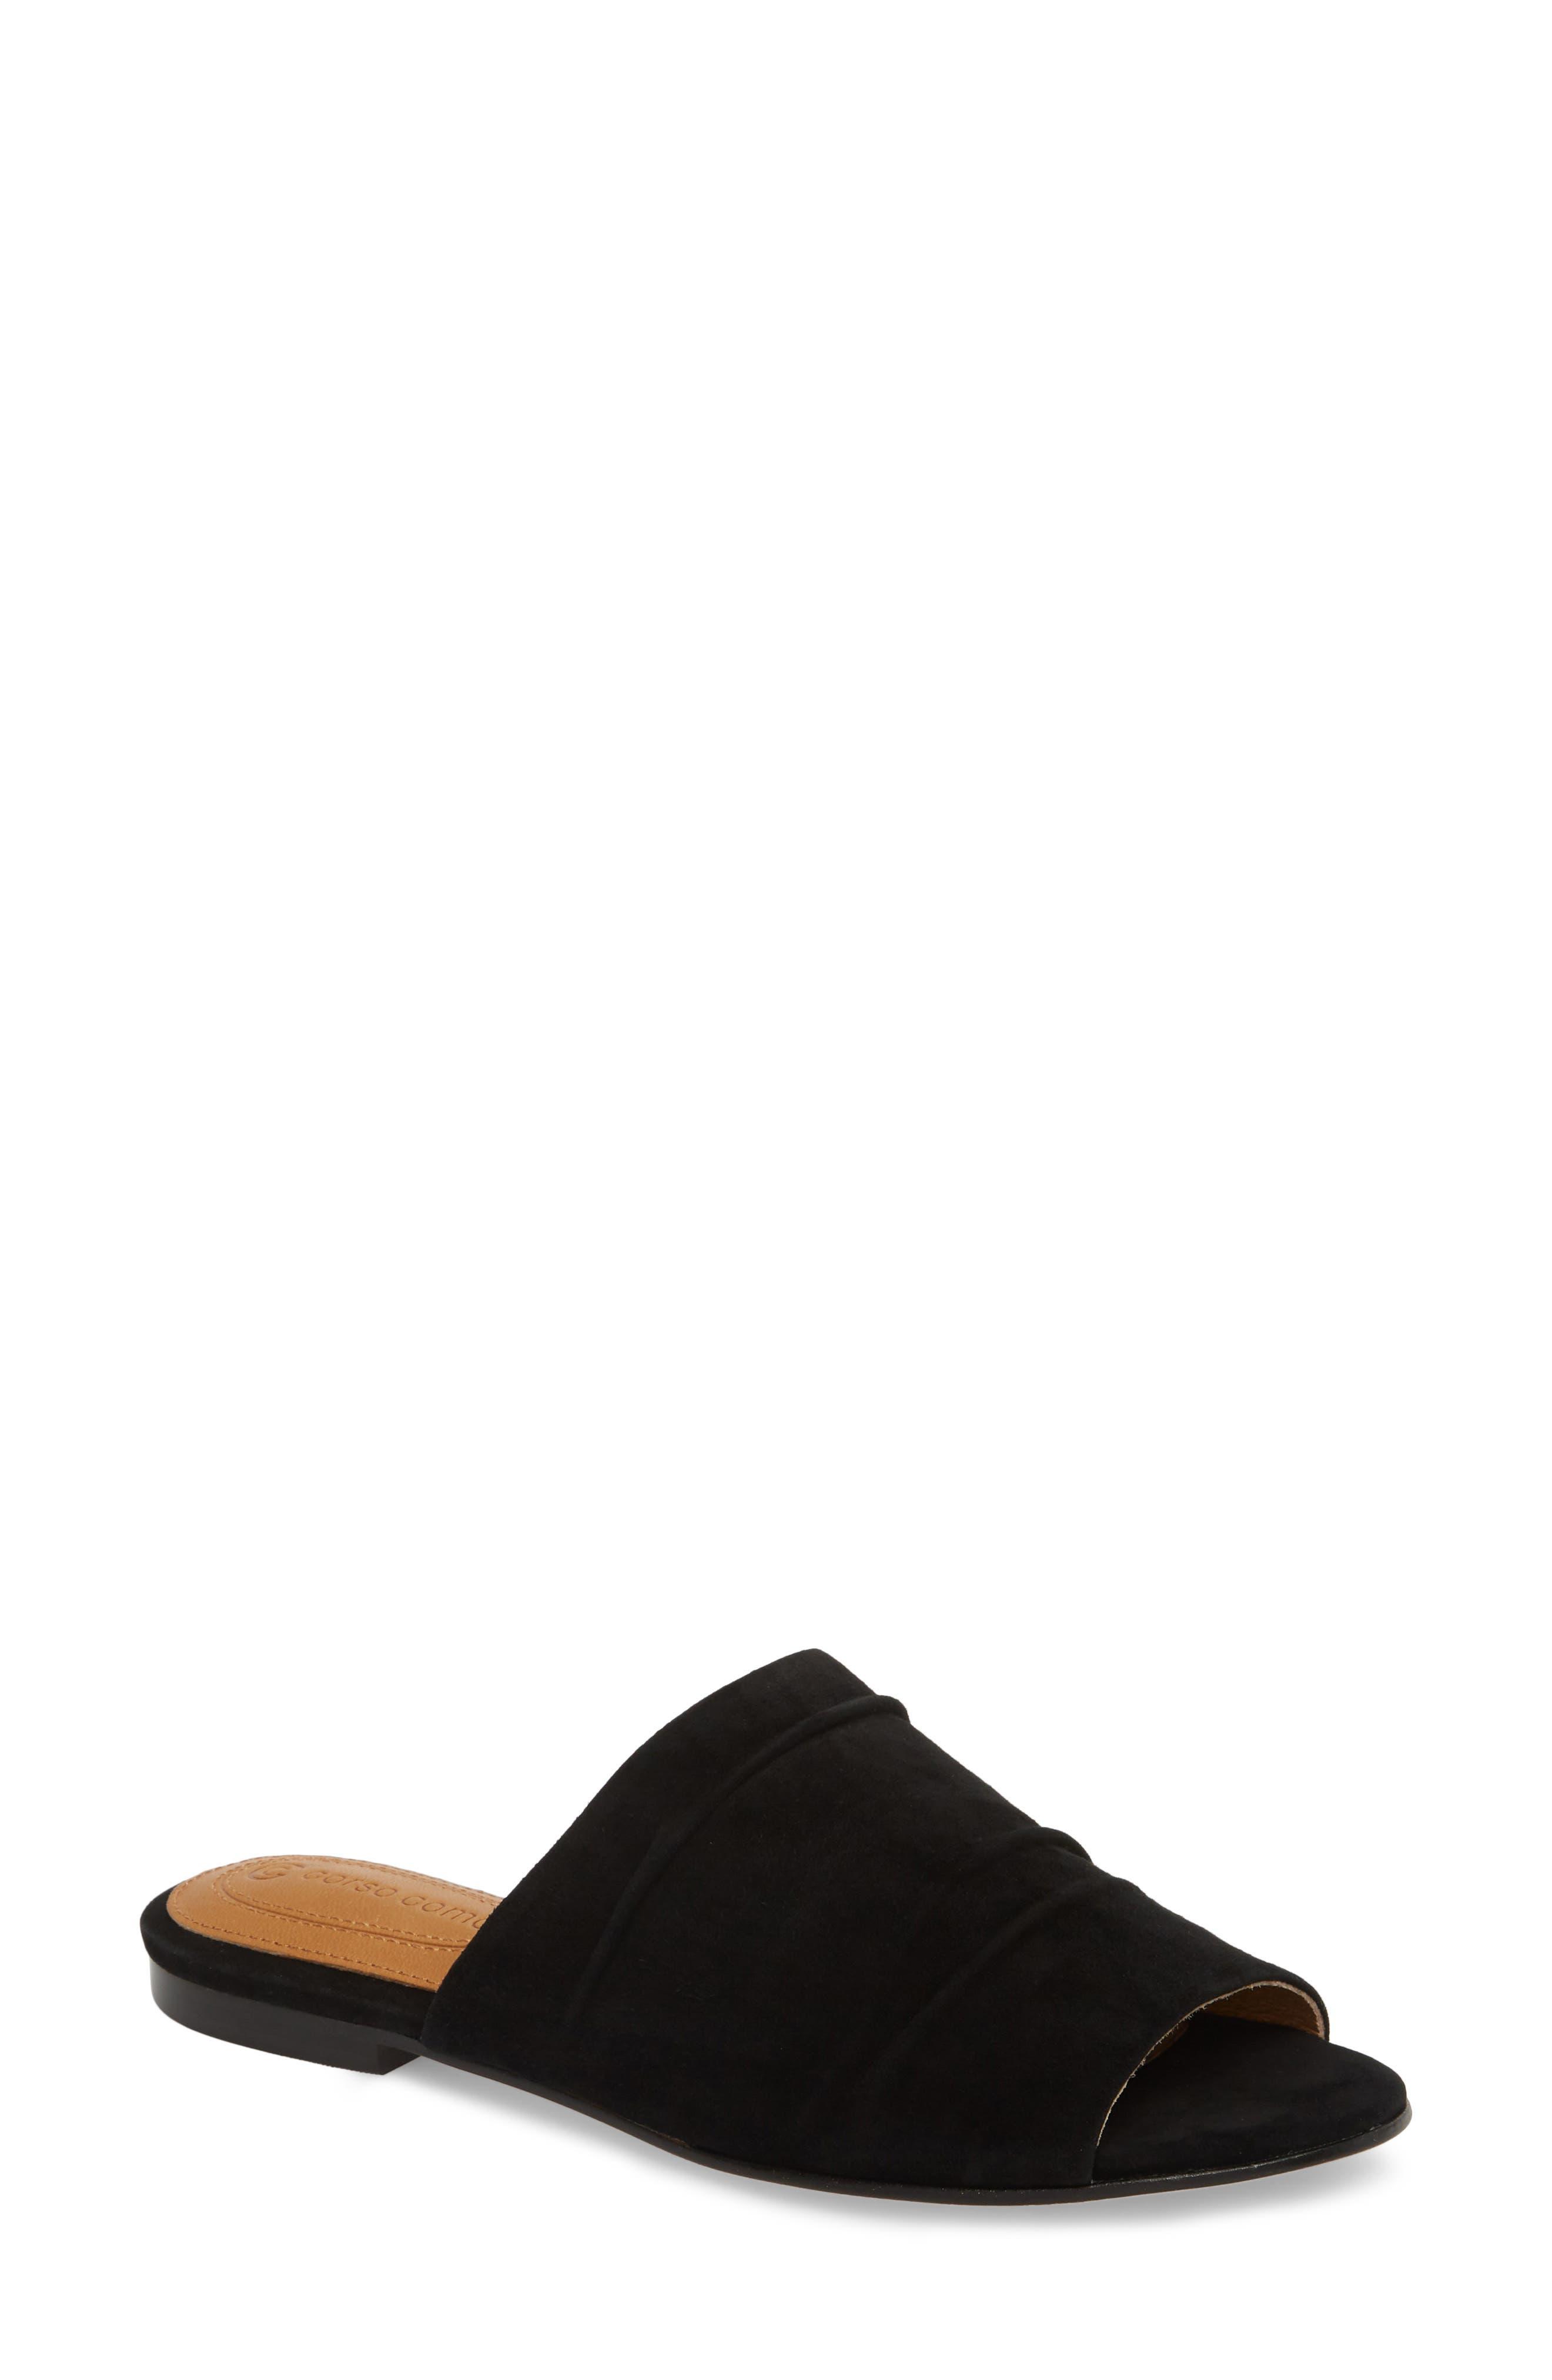 Beachaven Slide Sandal,                         Main,                         color, Black Suede